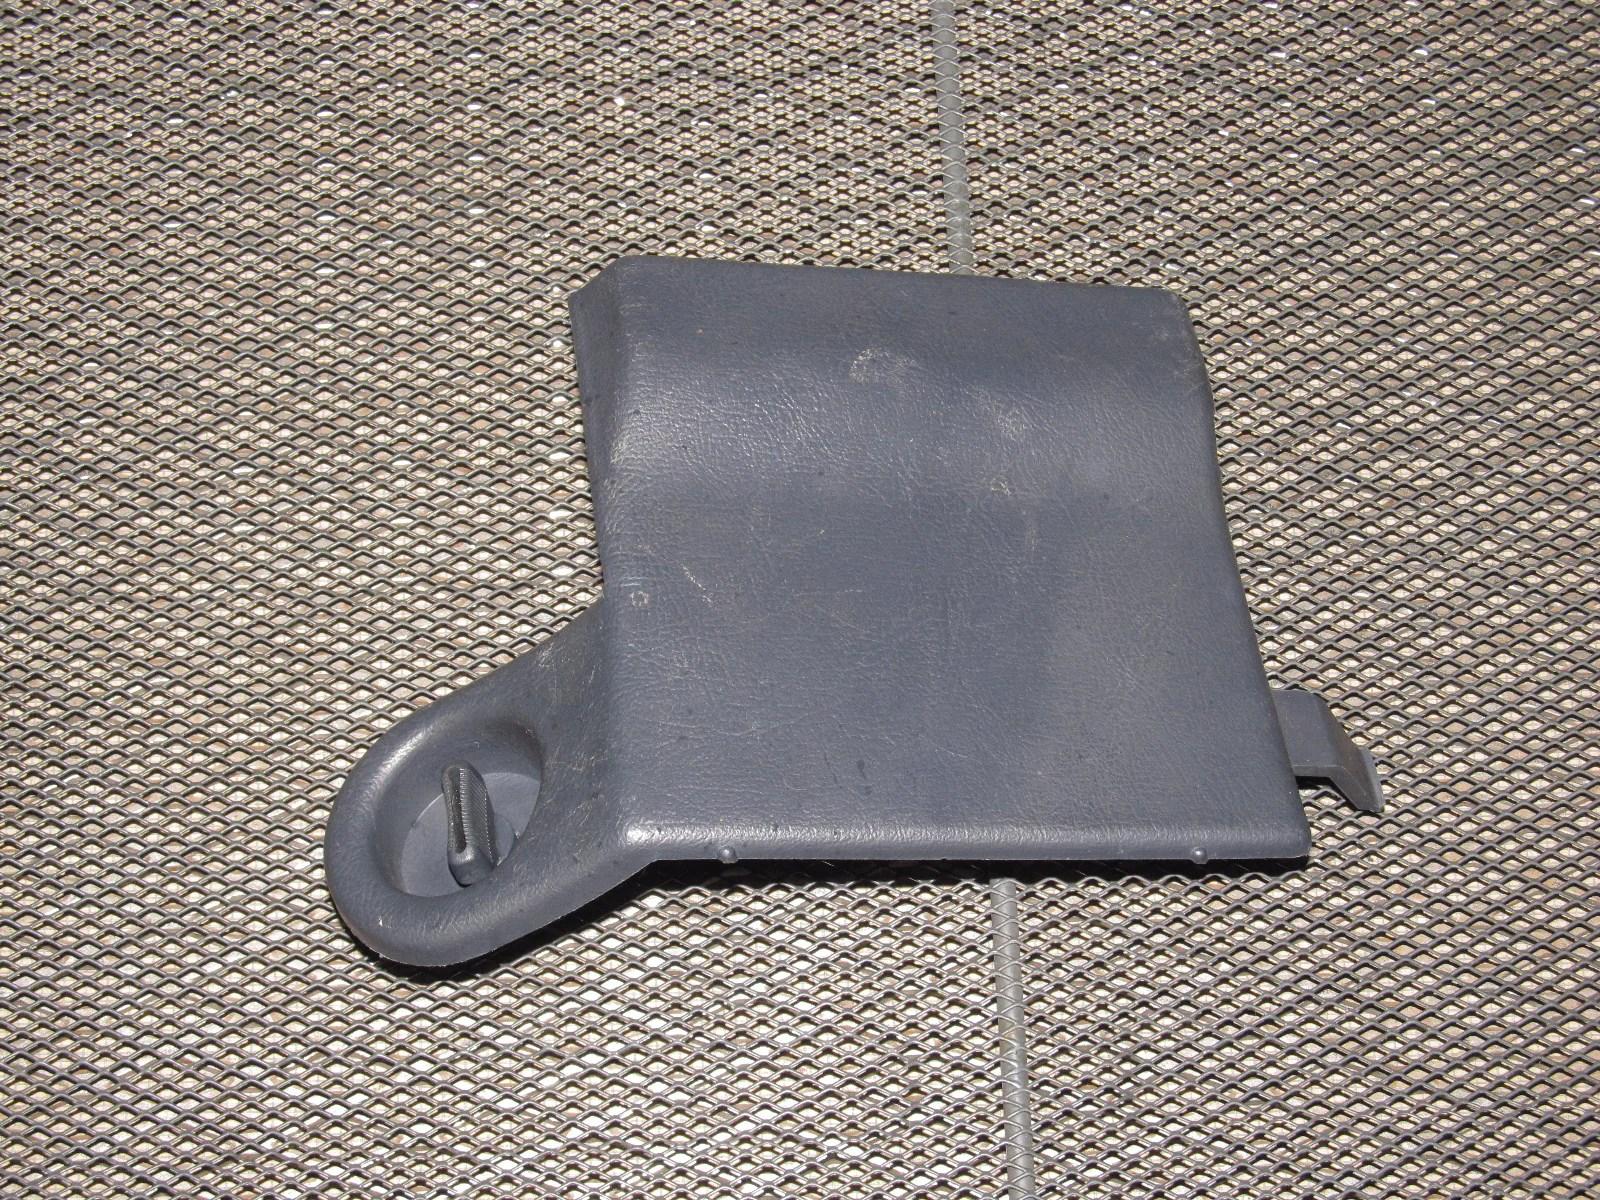 95 96 honda prelude oem interior fuse box cover product image  [ 1600 x 1200 Pixel ]